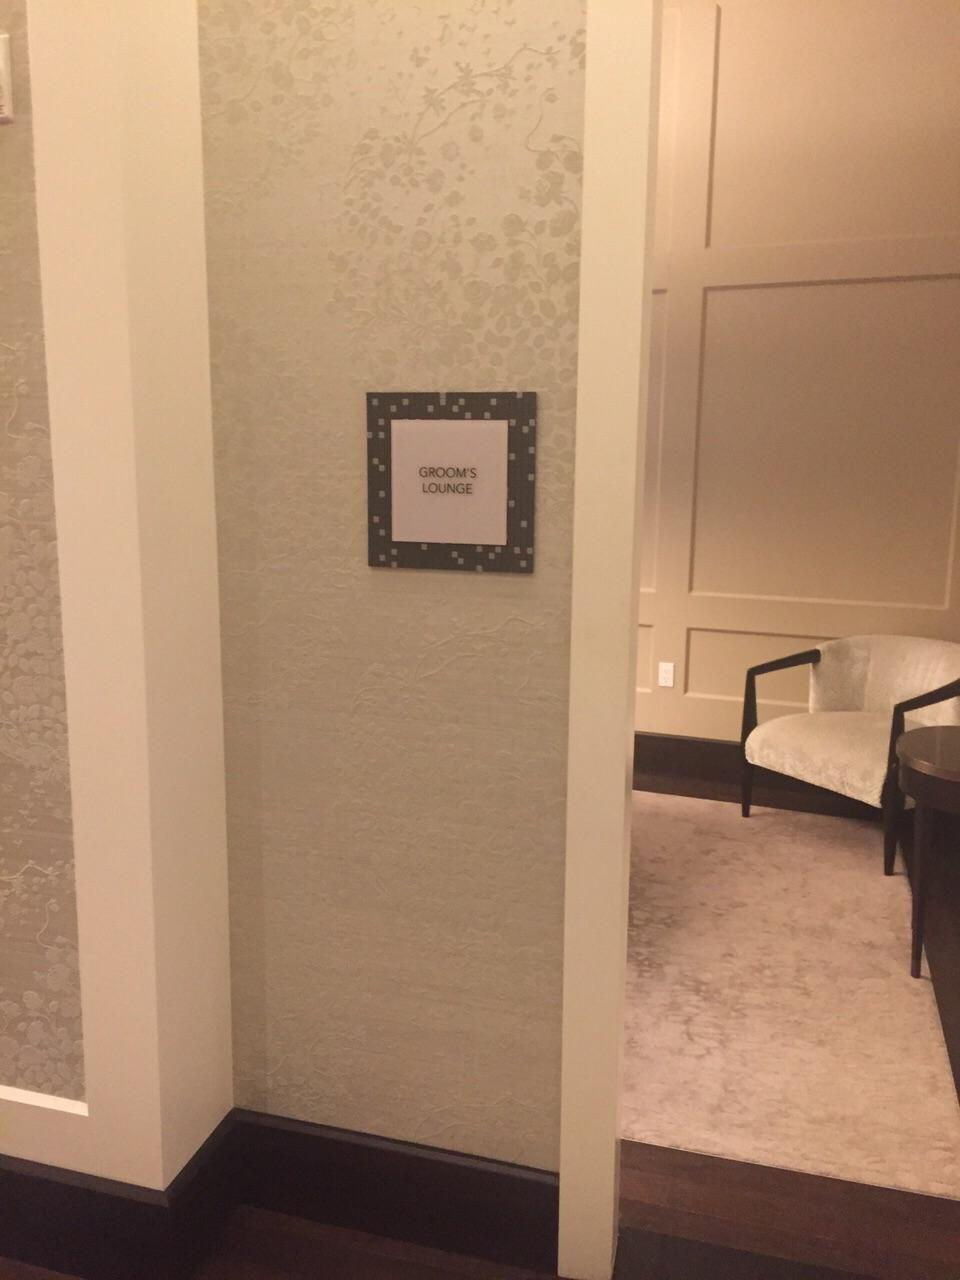 Groom room (Photo credit: Demi Eni-Olorunda)